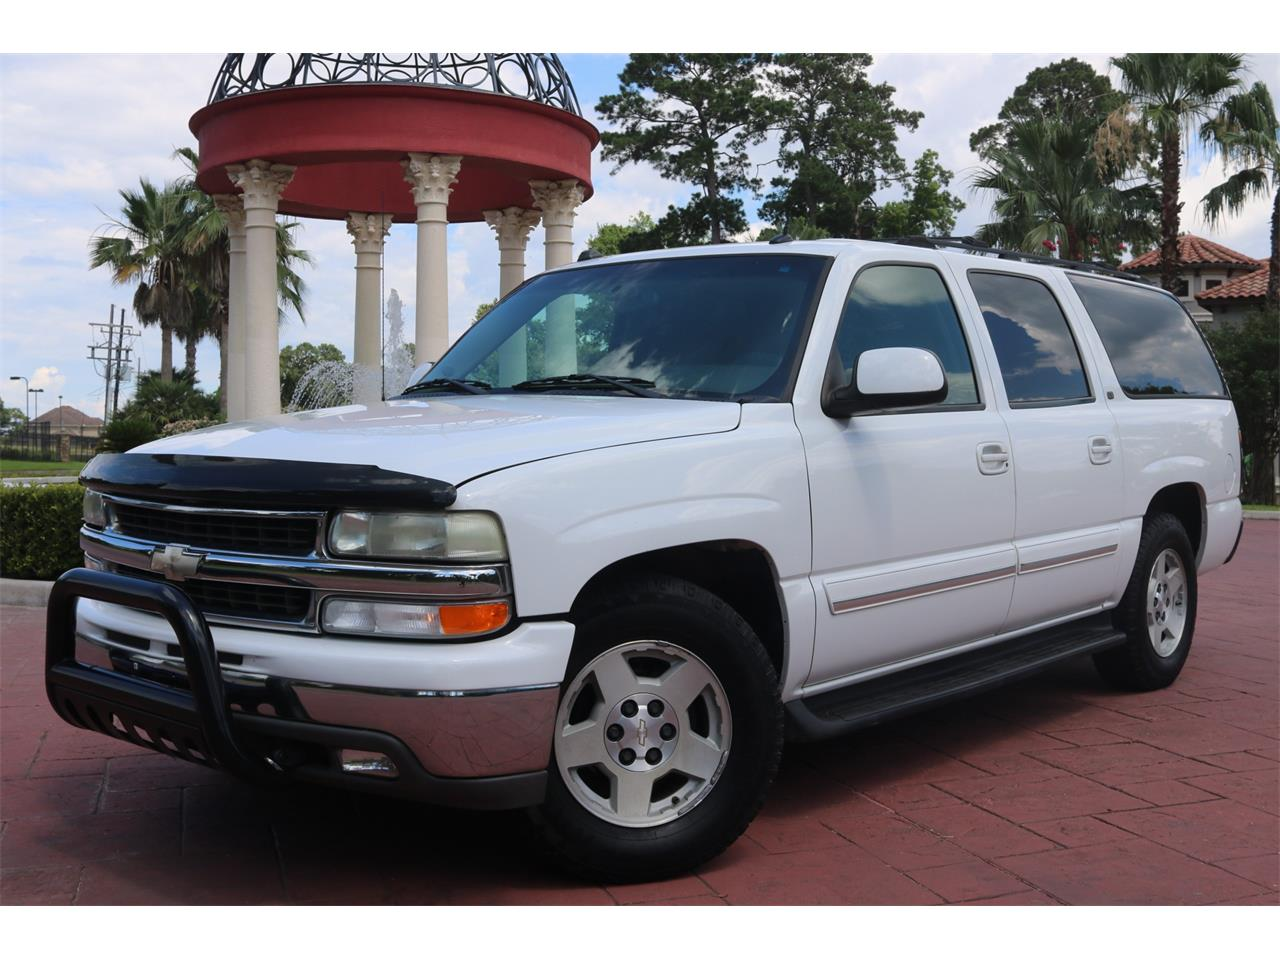 2004 Chevrolet Suburban (CC-1380641) for sale in Conroe, Texas